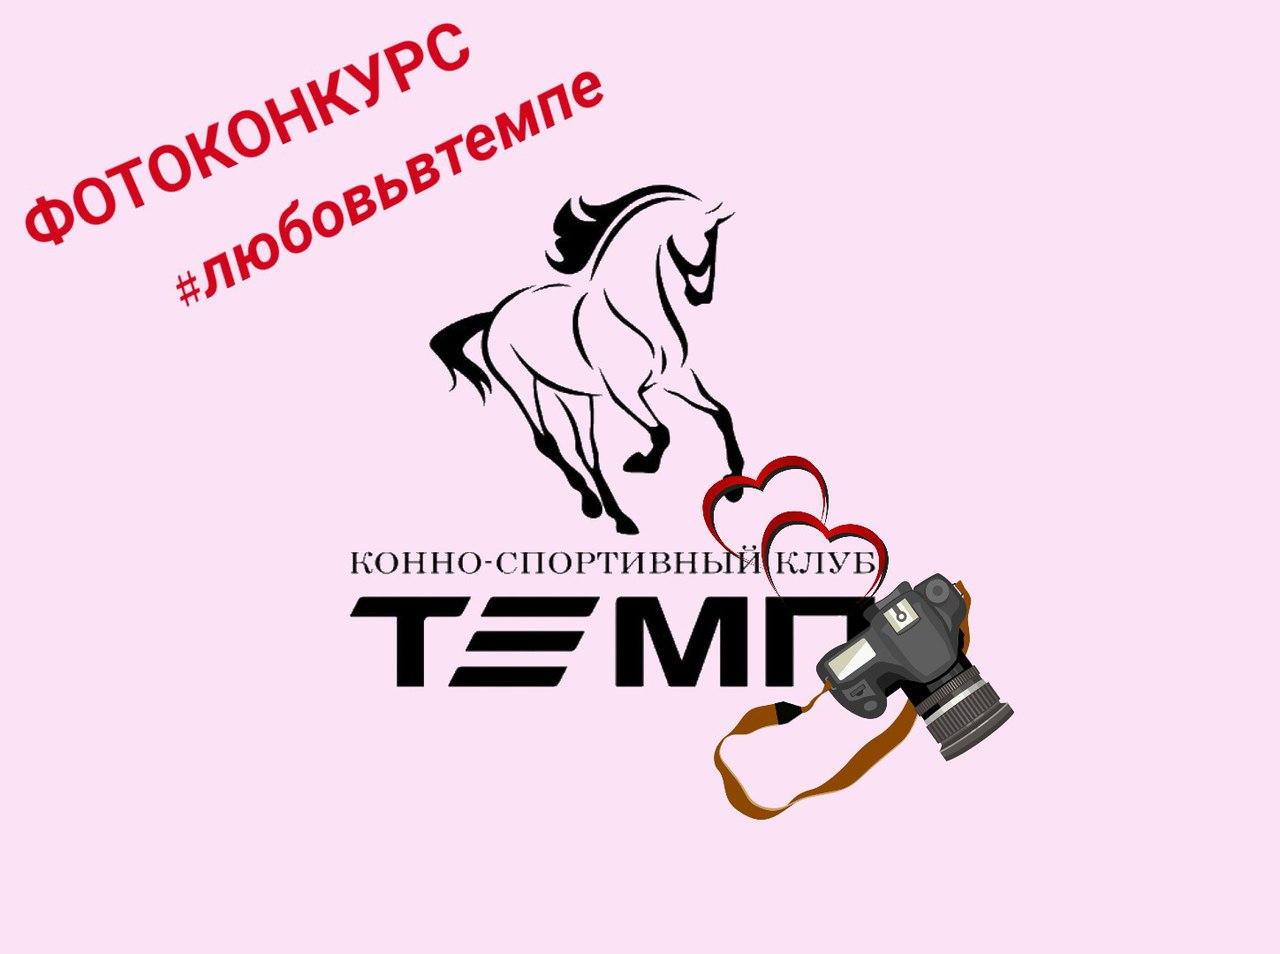 bgo-Kb0_nMI